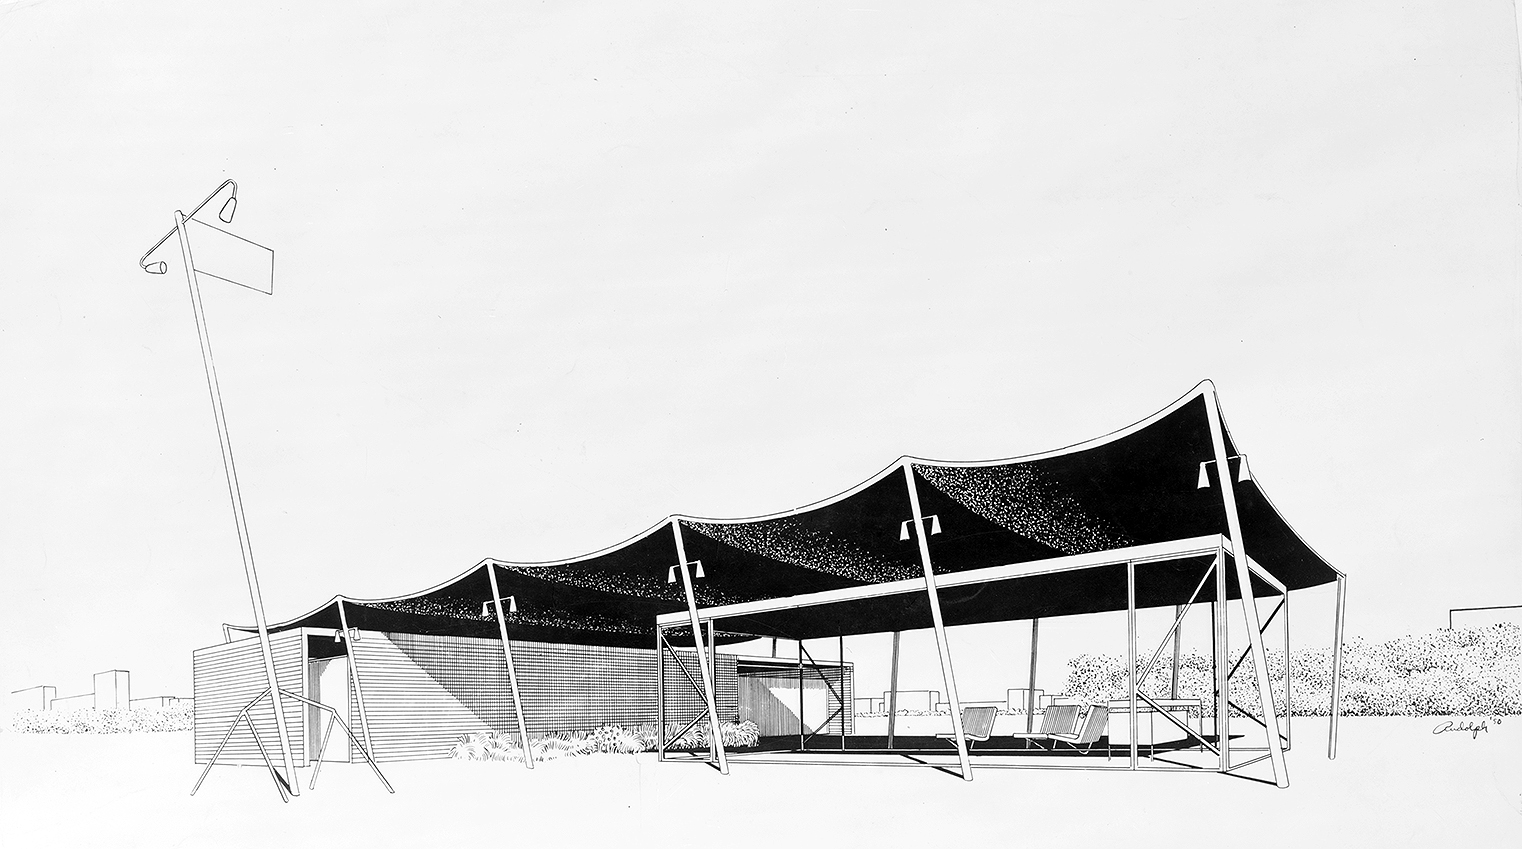 Beach Pavilion. Perspective Rendering. 1950.